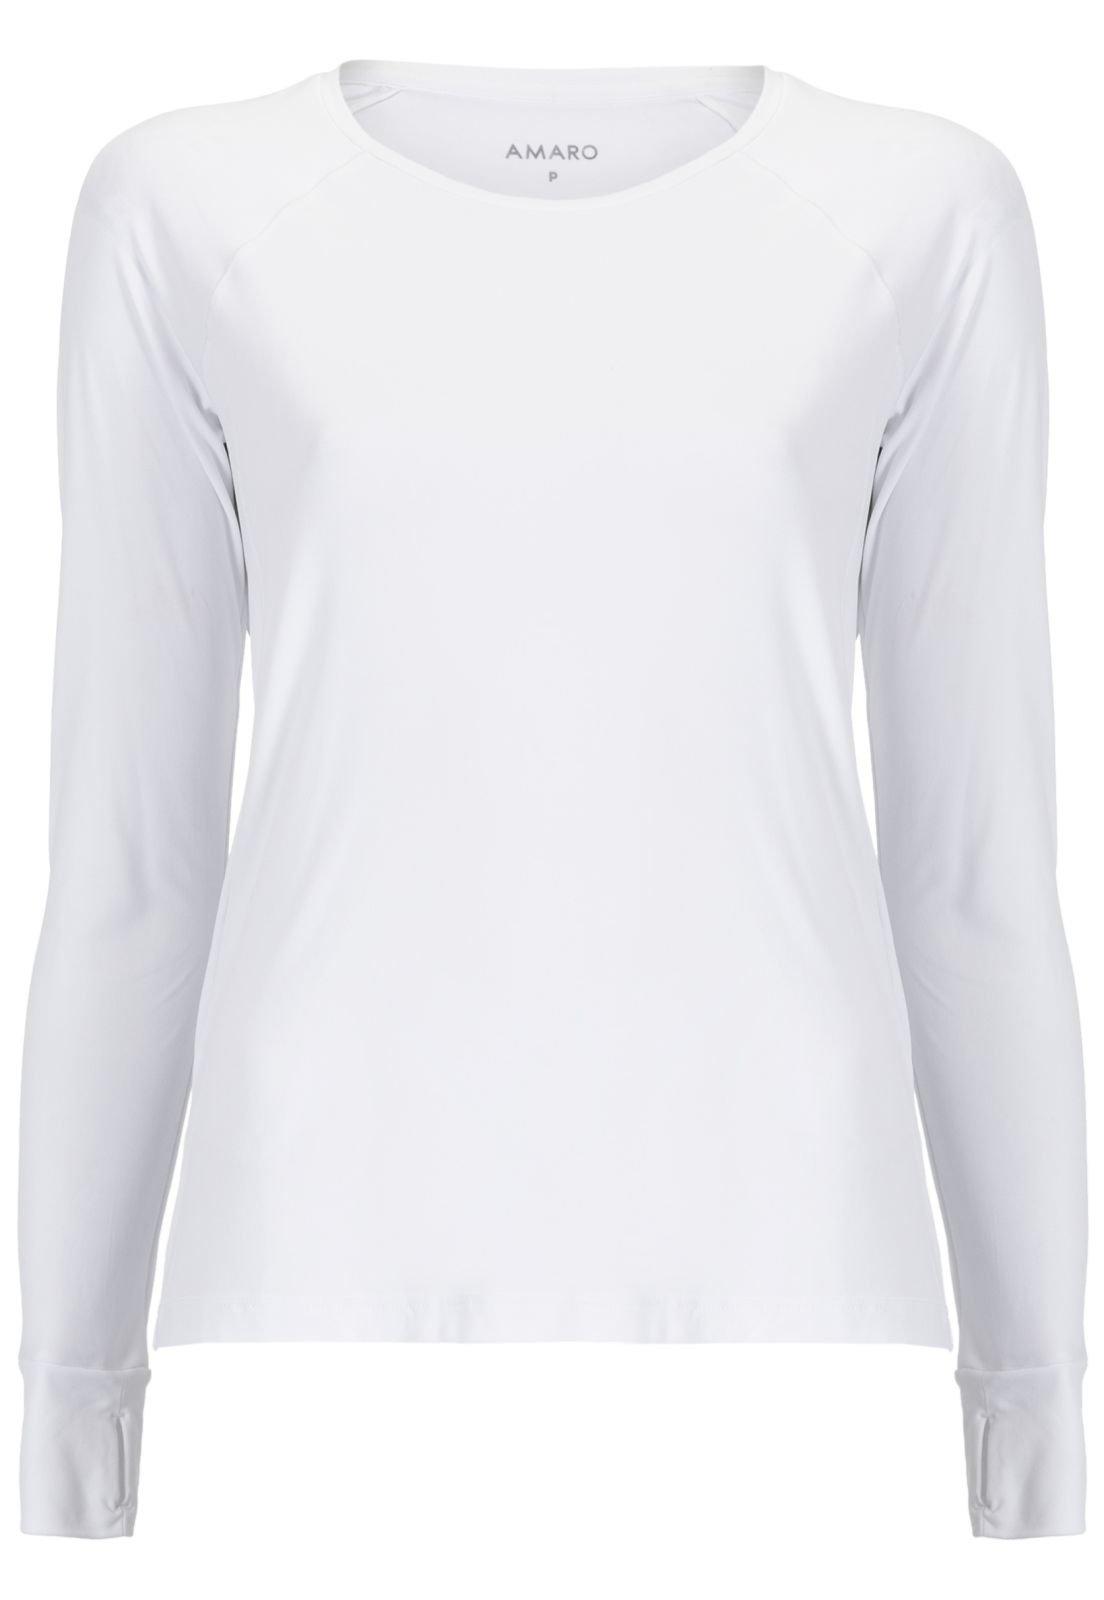 Camiseta AMARO Manga Longa Esportiva Branco - Compre Agora